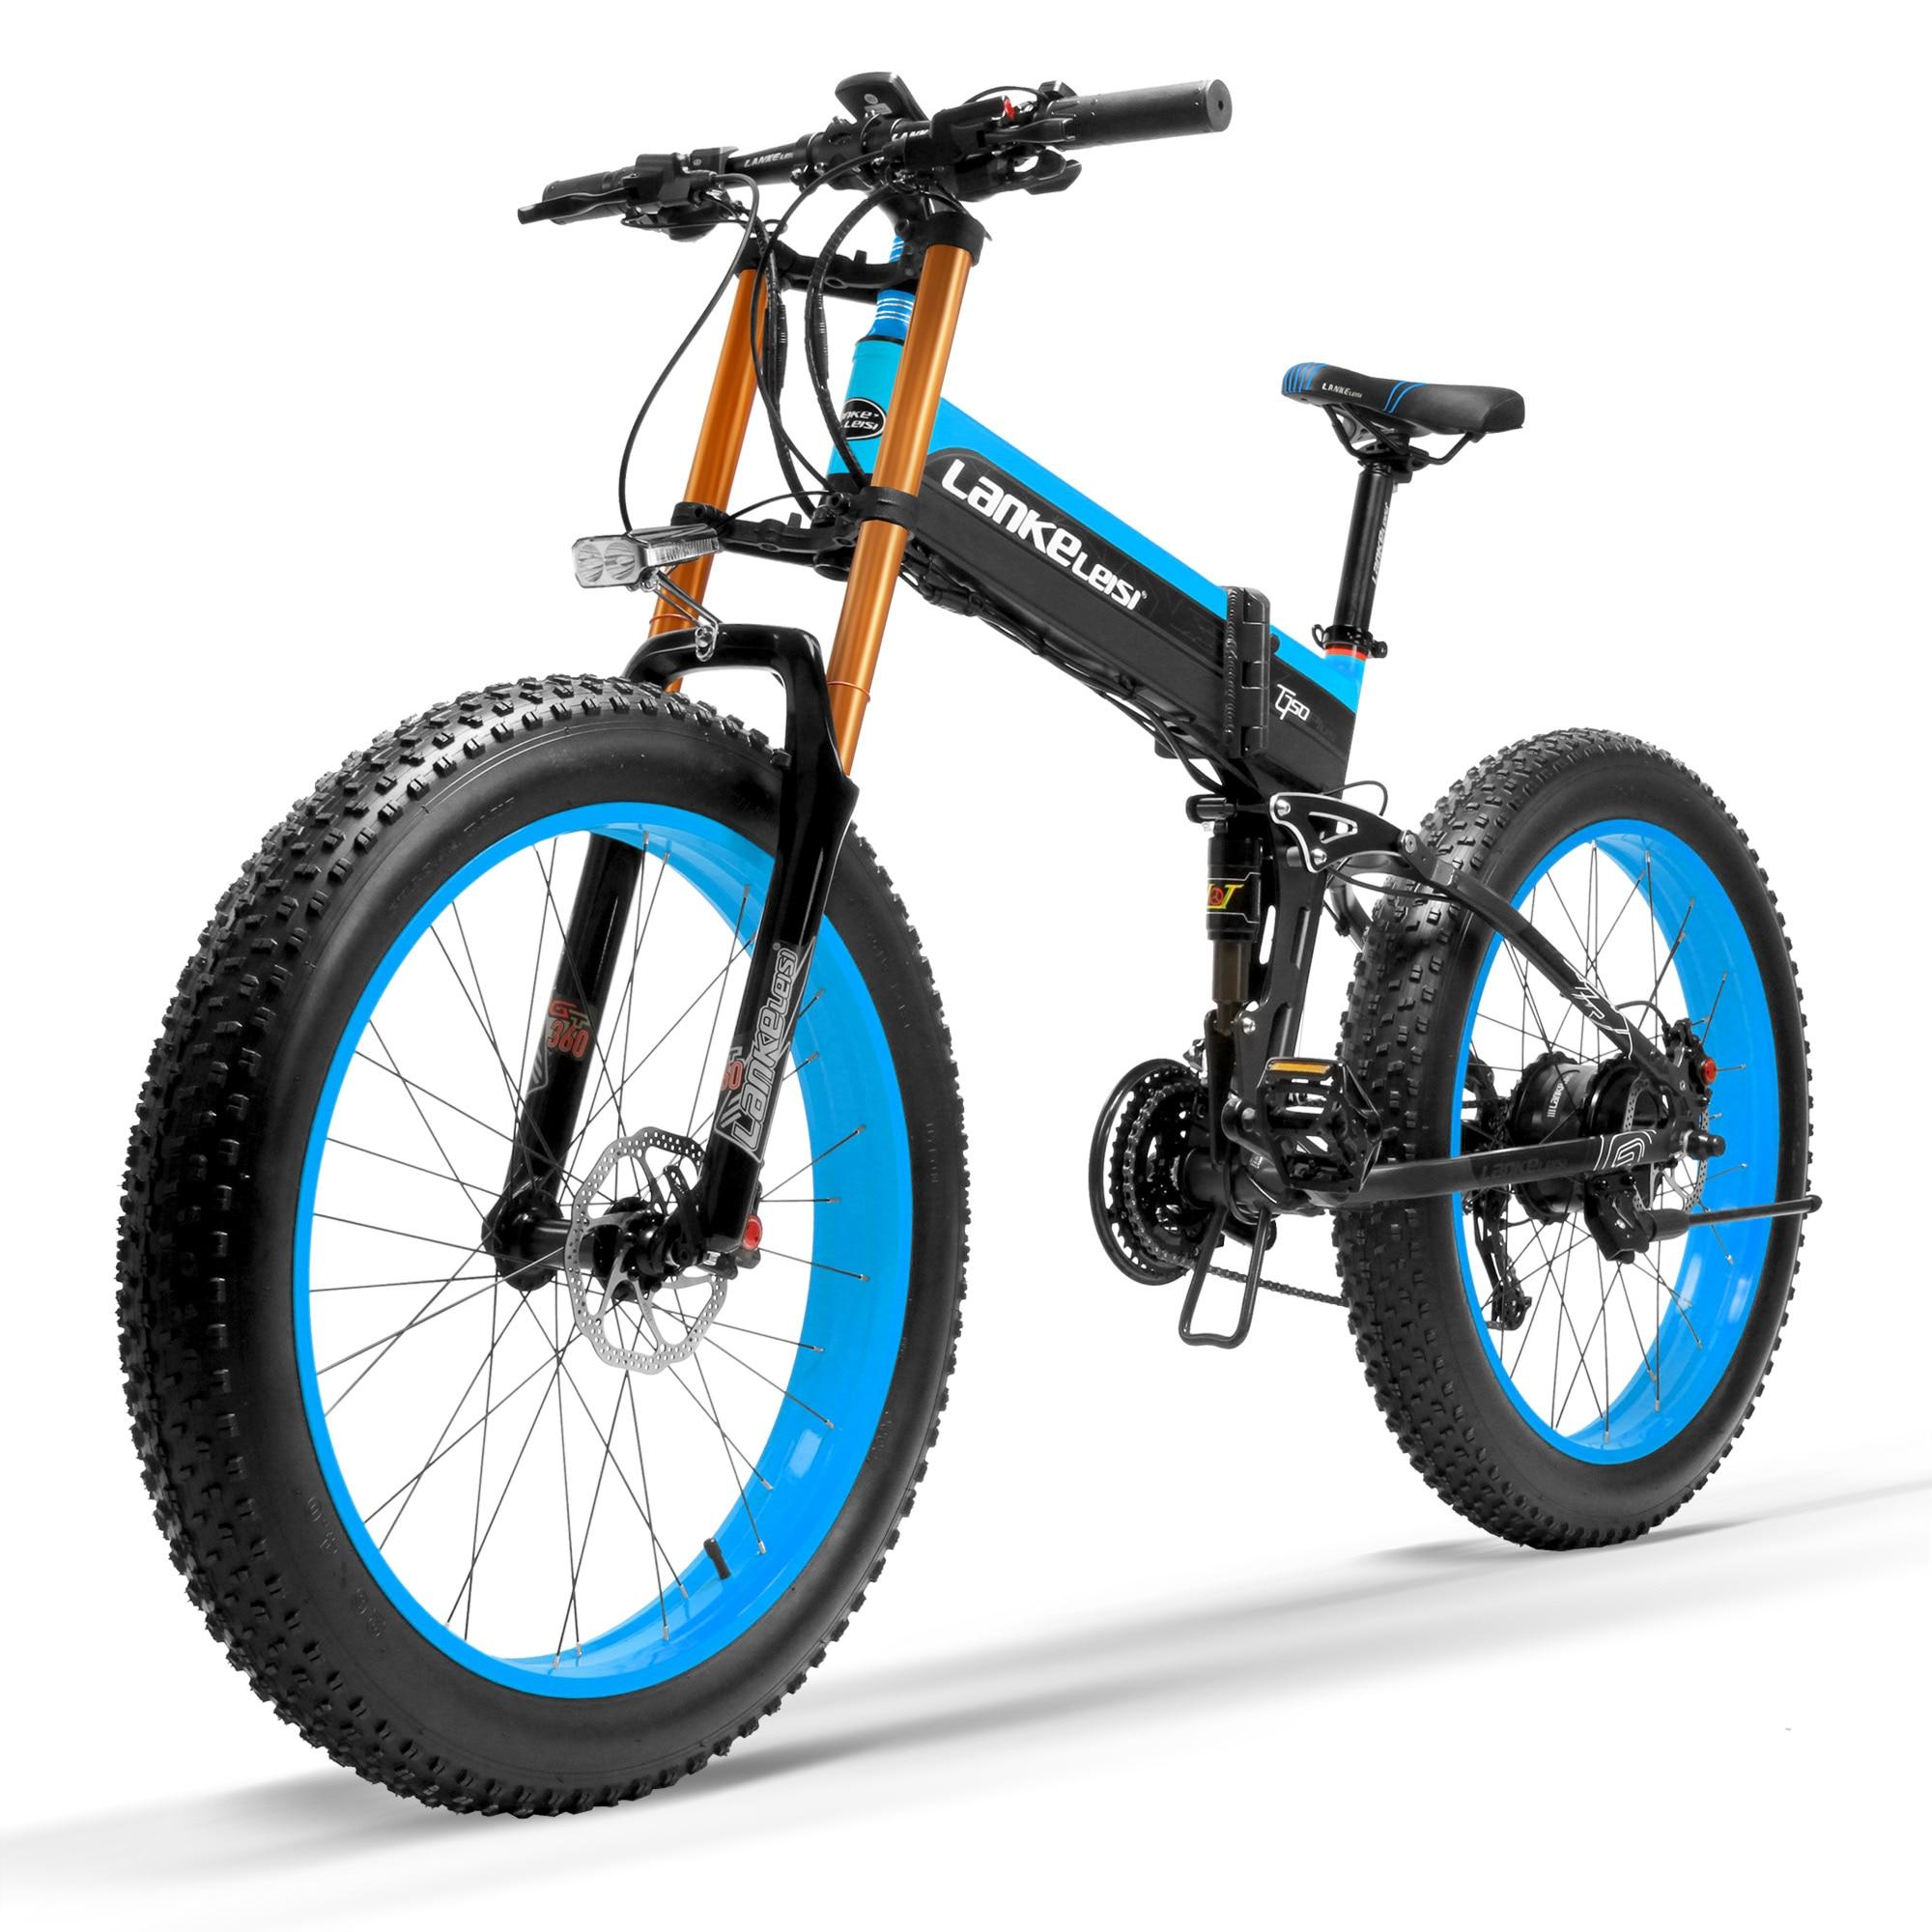 T750Plus Snow Bike 1000W Folding Electric Sand Bike, 48V High Performance Li-ion Battery,5 Level Pedal Assist Sensor Fat Bike 1